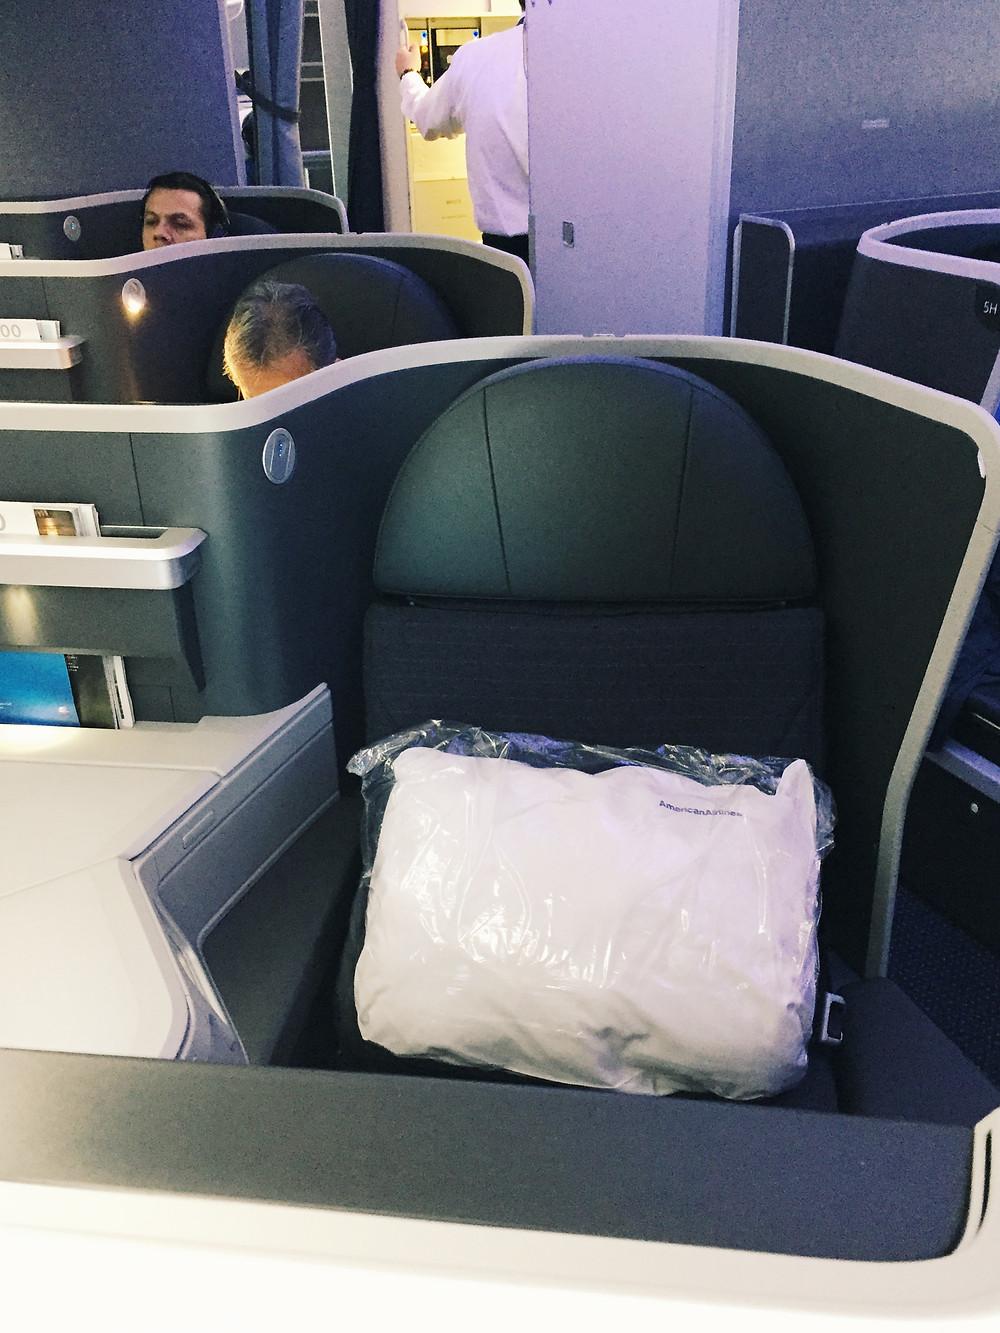 American Airlines, B/E Aerospace Diamond Business Class Seat